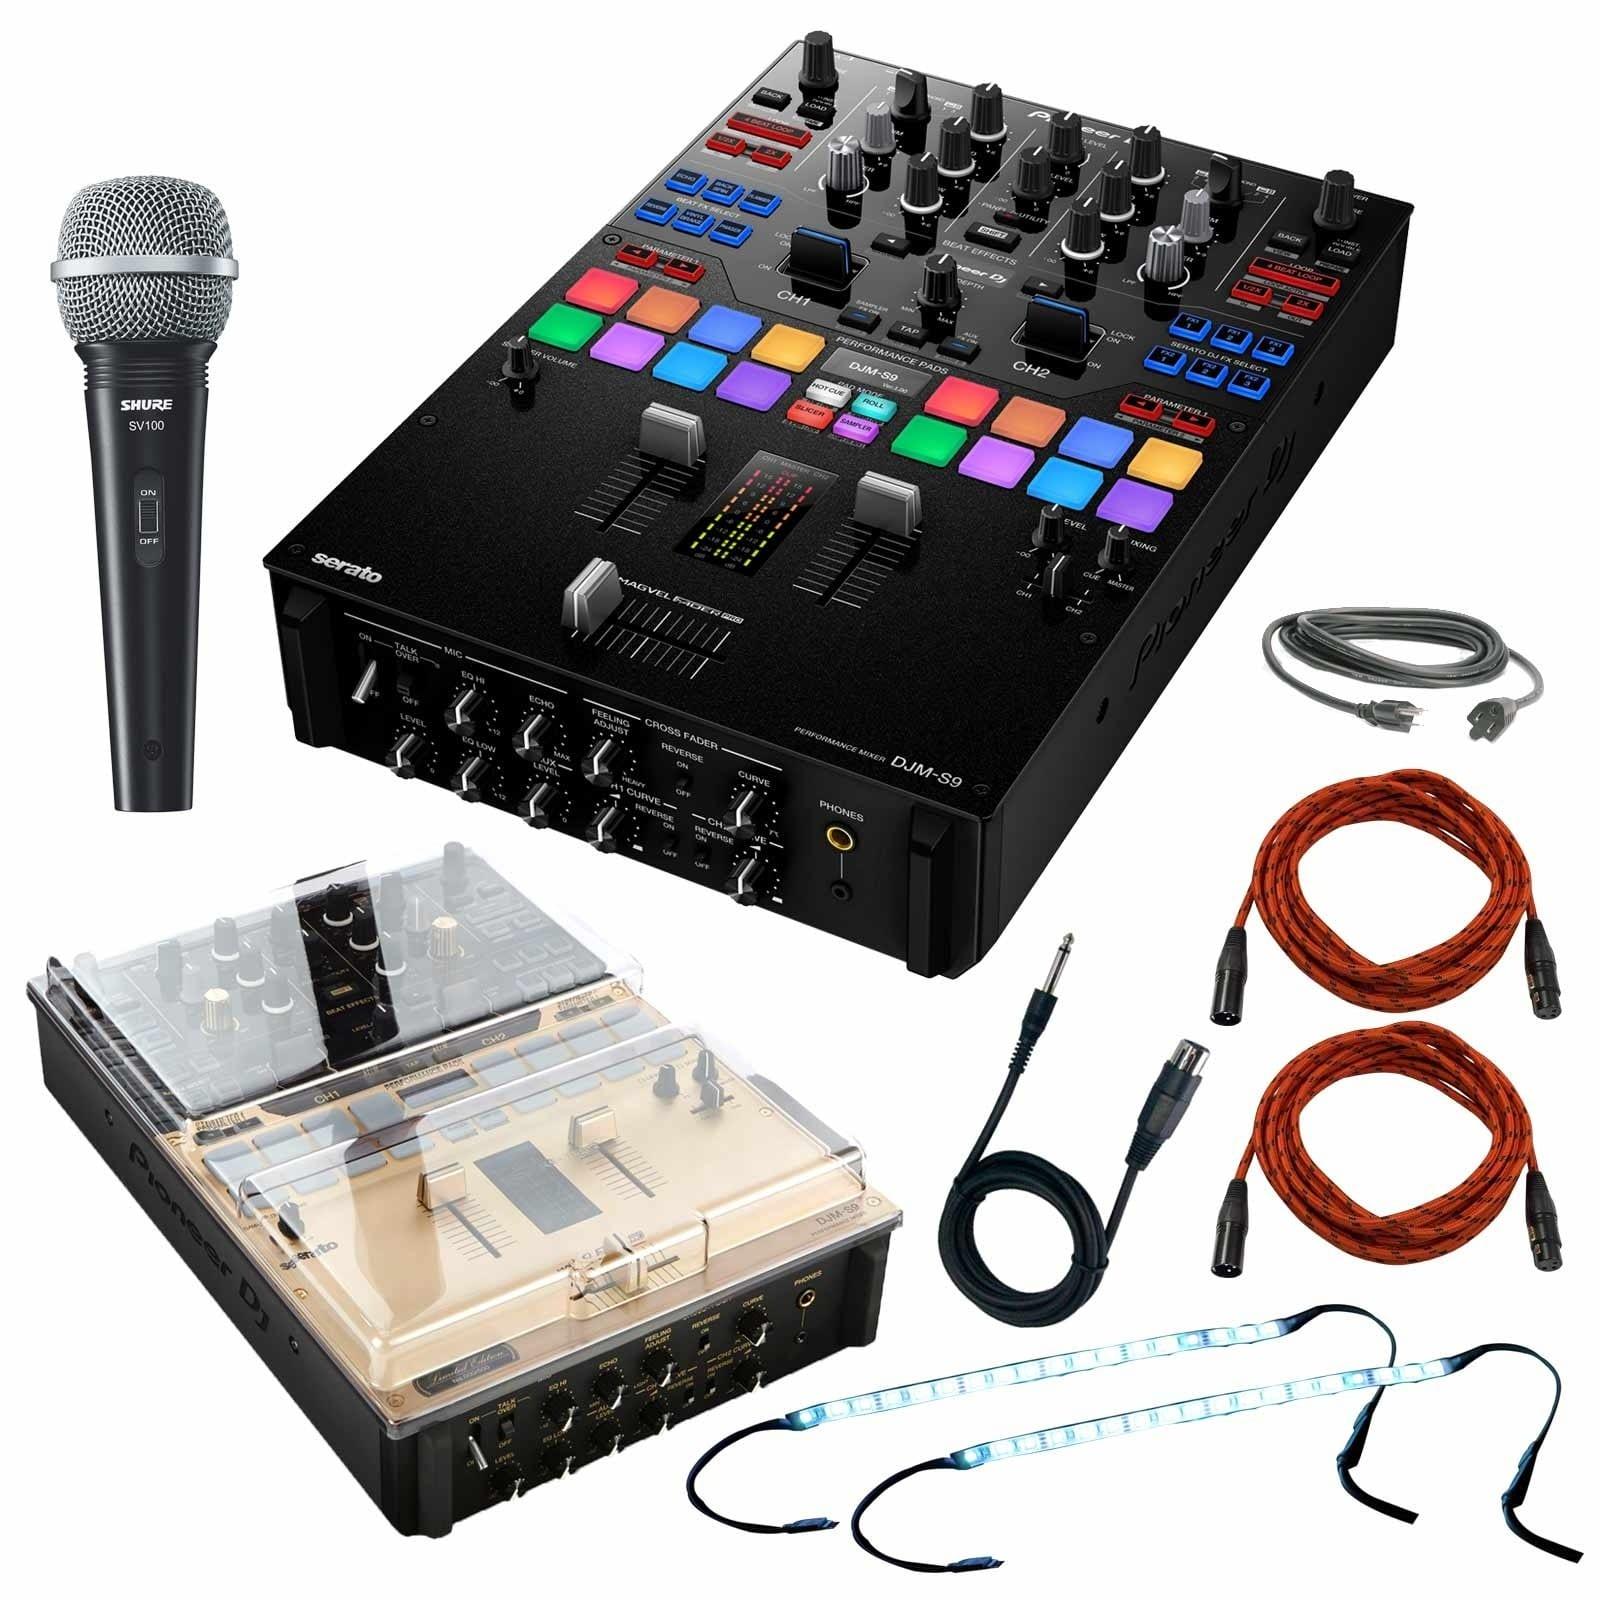 Pioneer DJM-S9 Professional 2-Channel Serato Battle Mixer